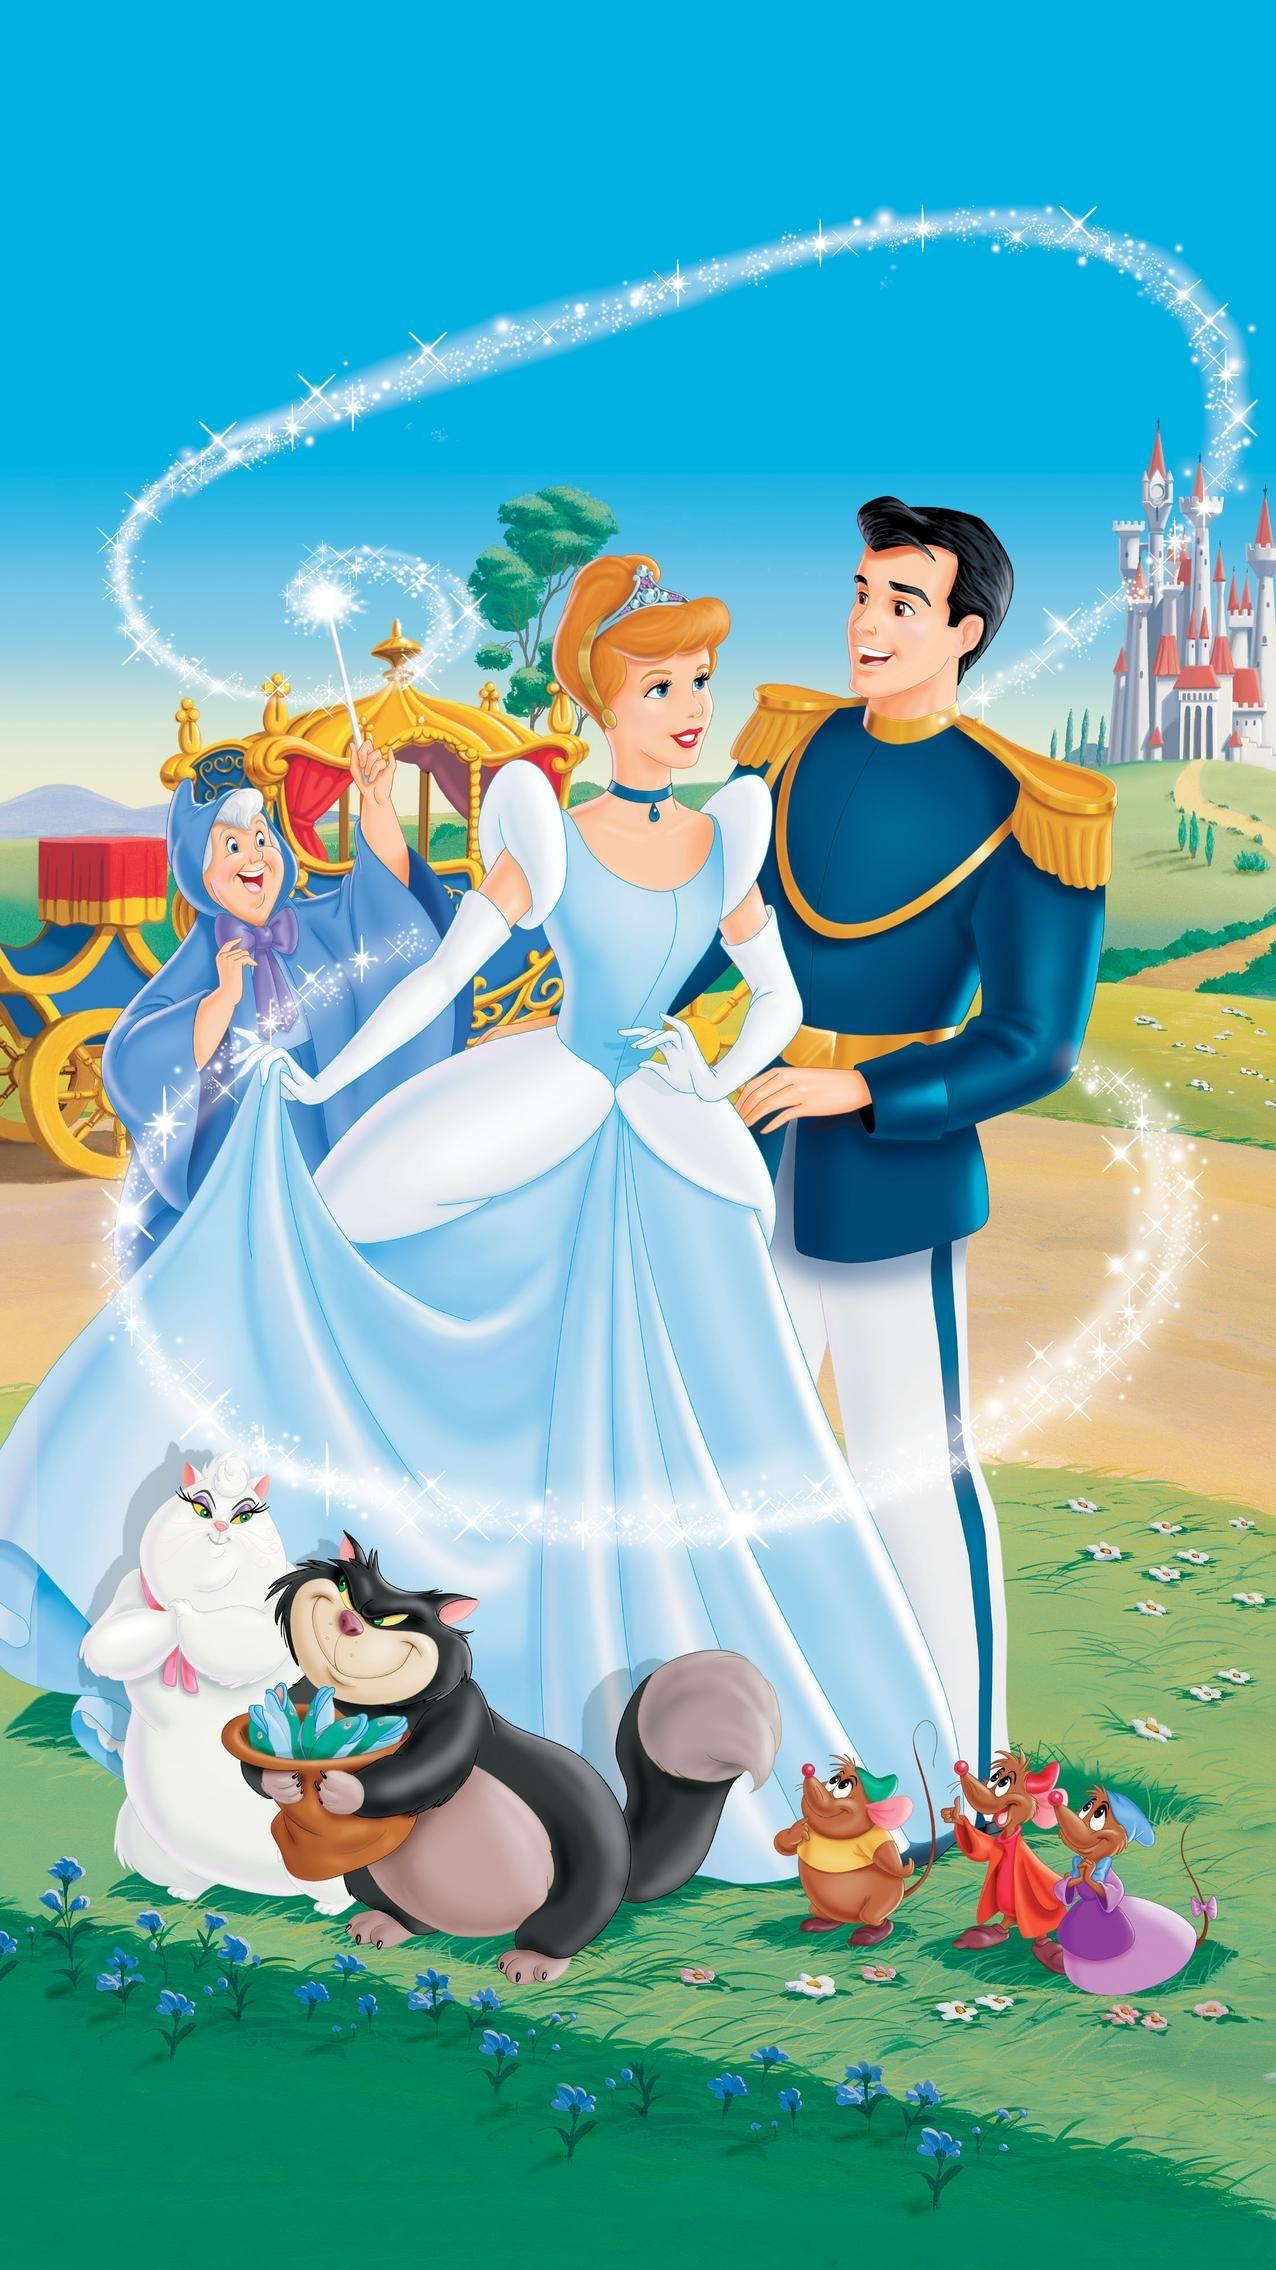 Cinderella 1950 Phone Wallpaper Moviemania Iphone Background Disney Cinderella Wallpaper Disney Princess Images